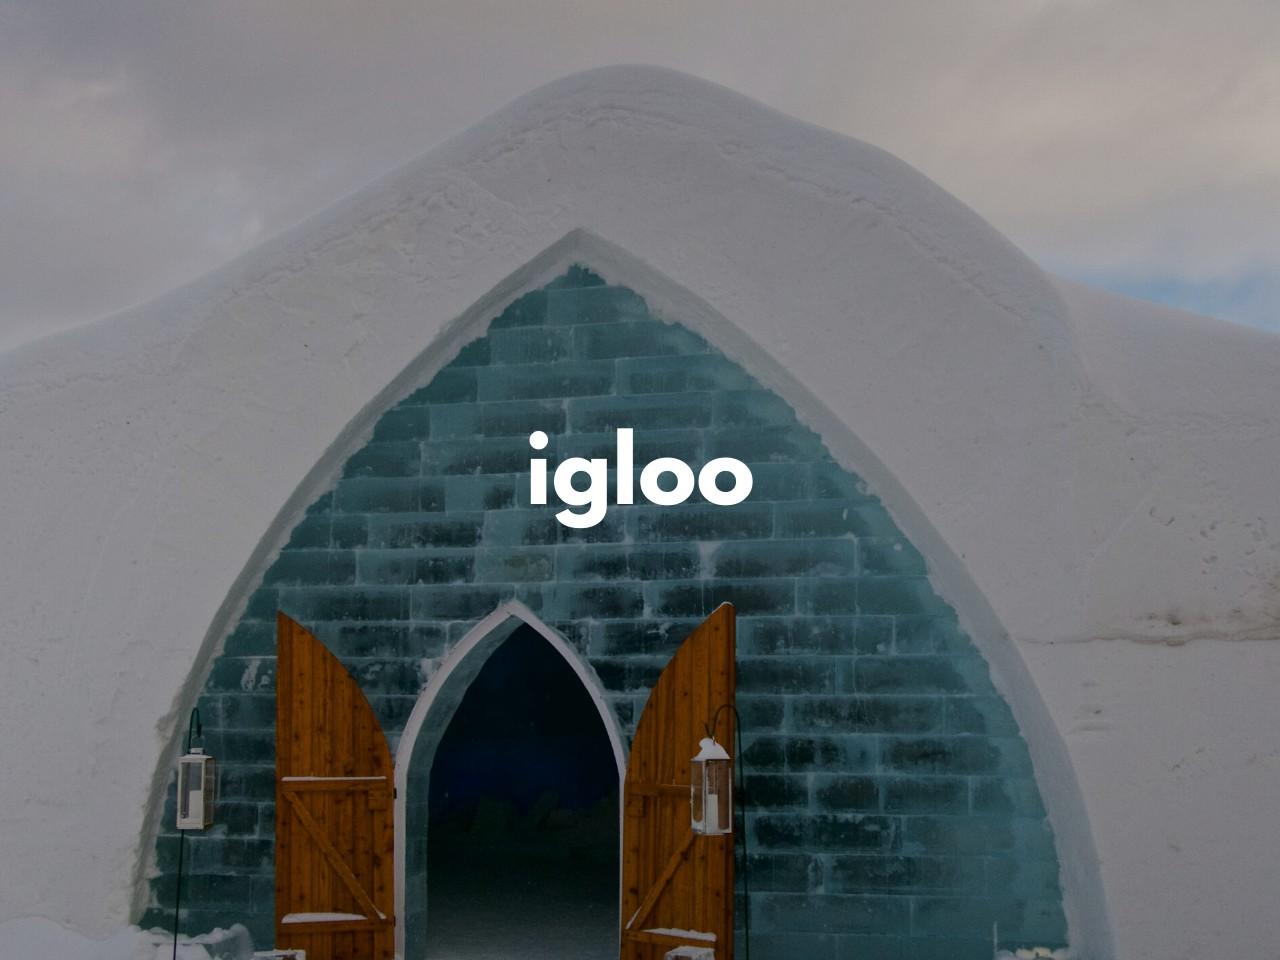 igloo : ドーム型の雪と氷の家